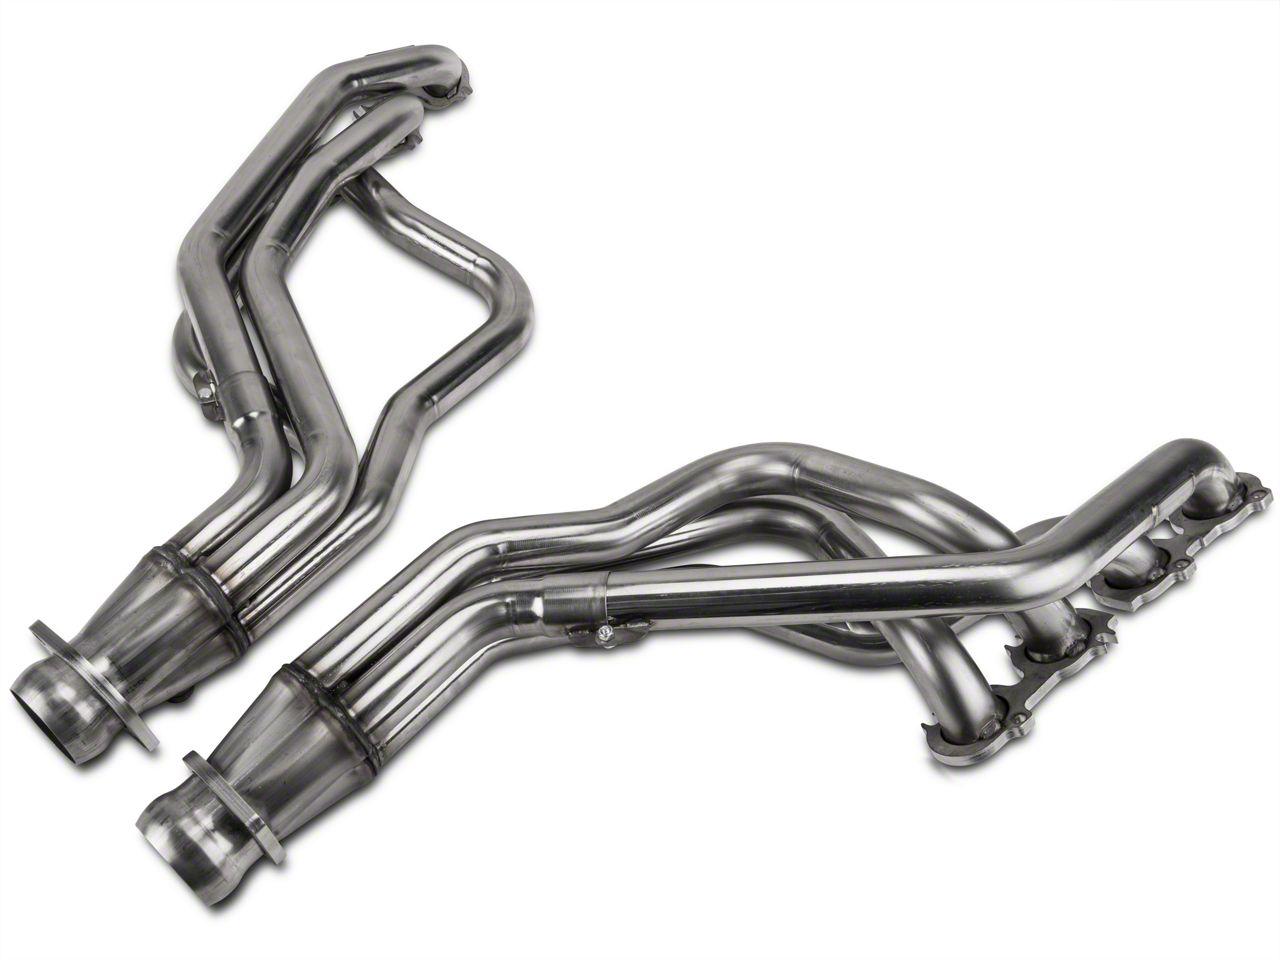 Kooks 1-3/4 in. Long Tube Headers (96-04 Cobra, Mach 1)